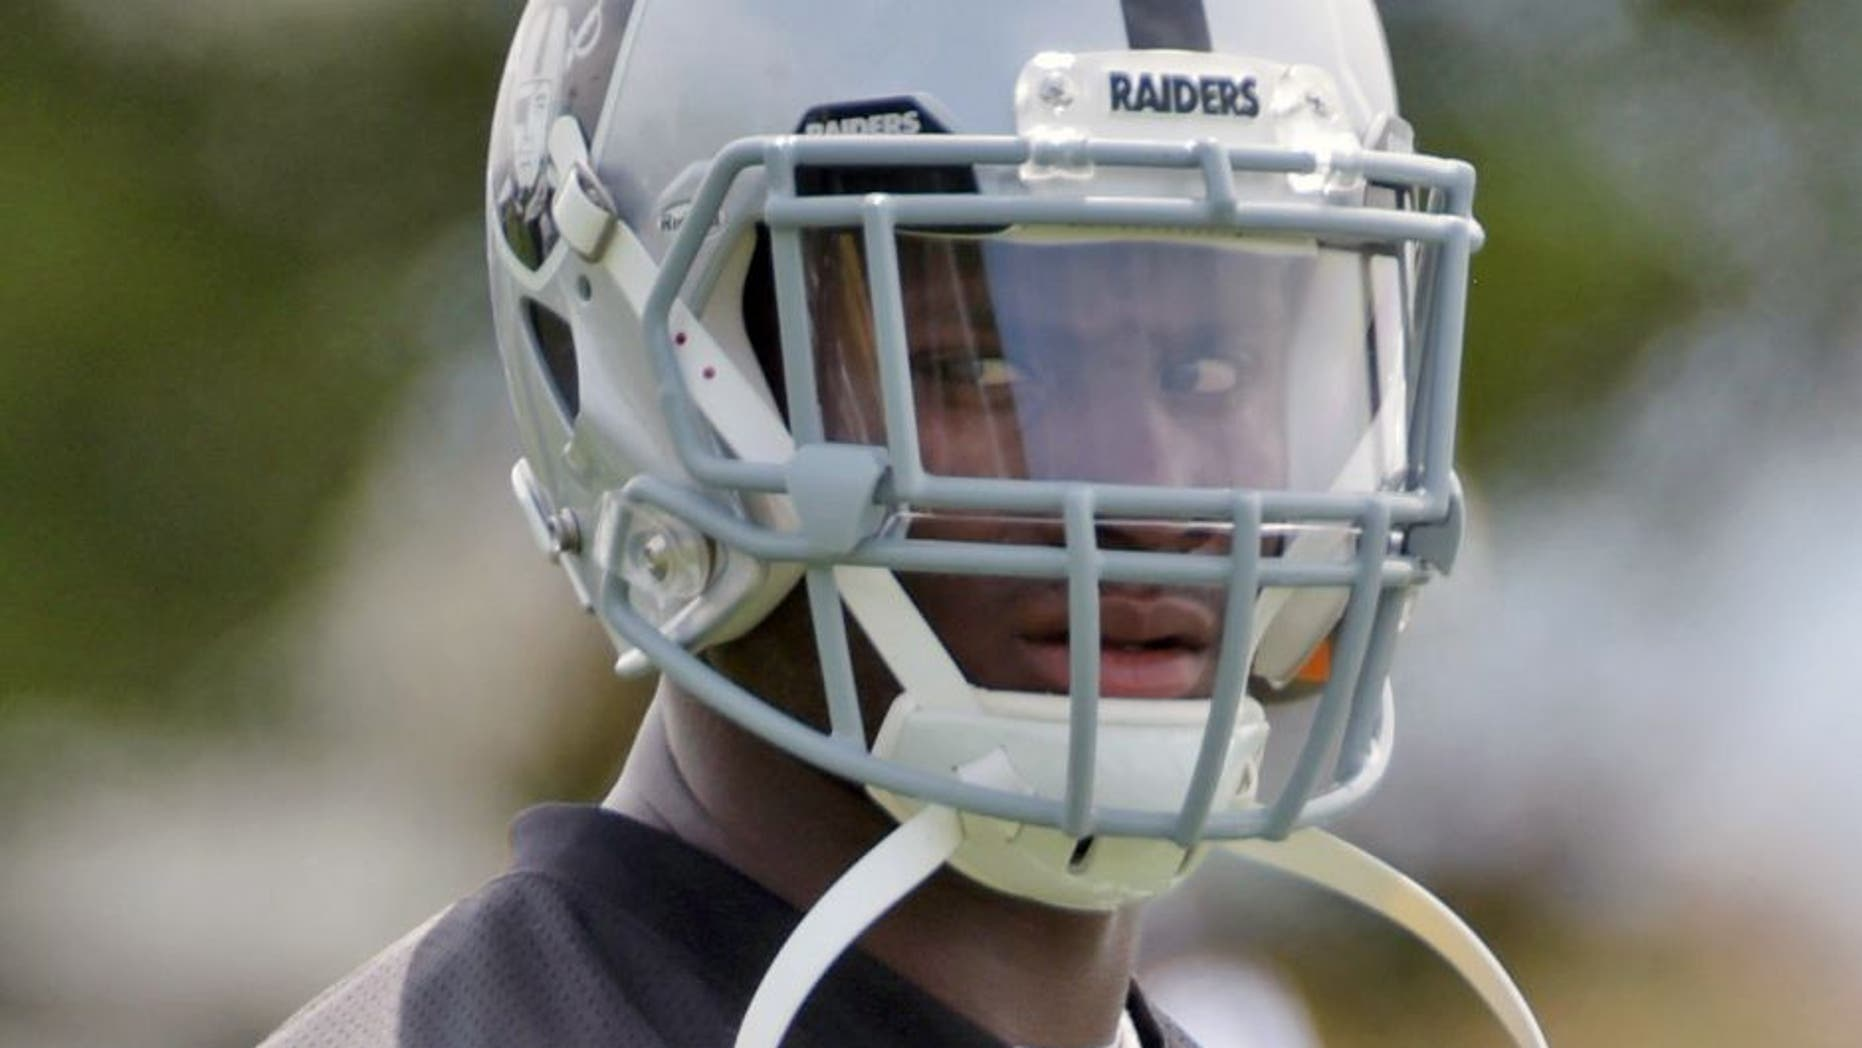 Jun 9, 2015; Oakland, CA, USA; Oakland Raiders running back Latavius Murray (28) at minicamp at the Raiders practice facility. Mandatory Credit: Kirby Lee-USA TODAY Sports